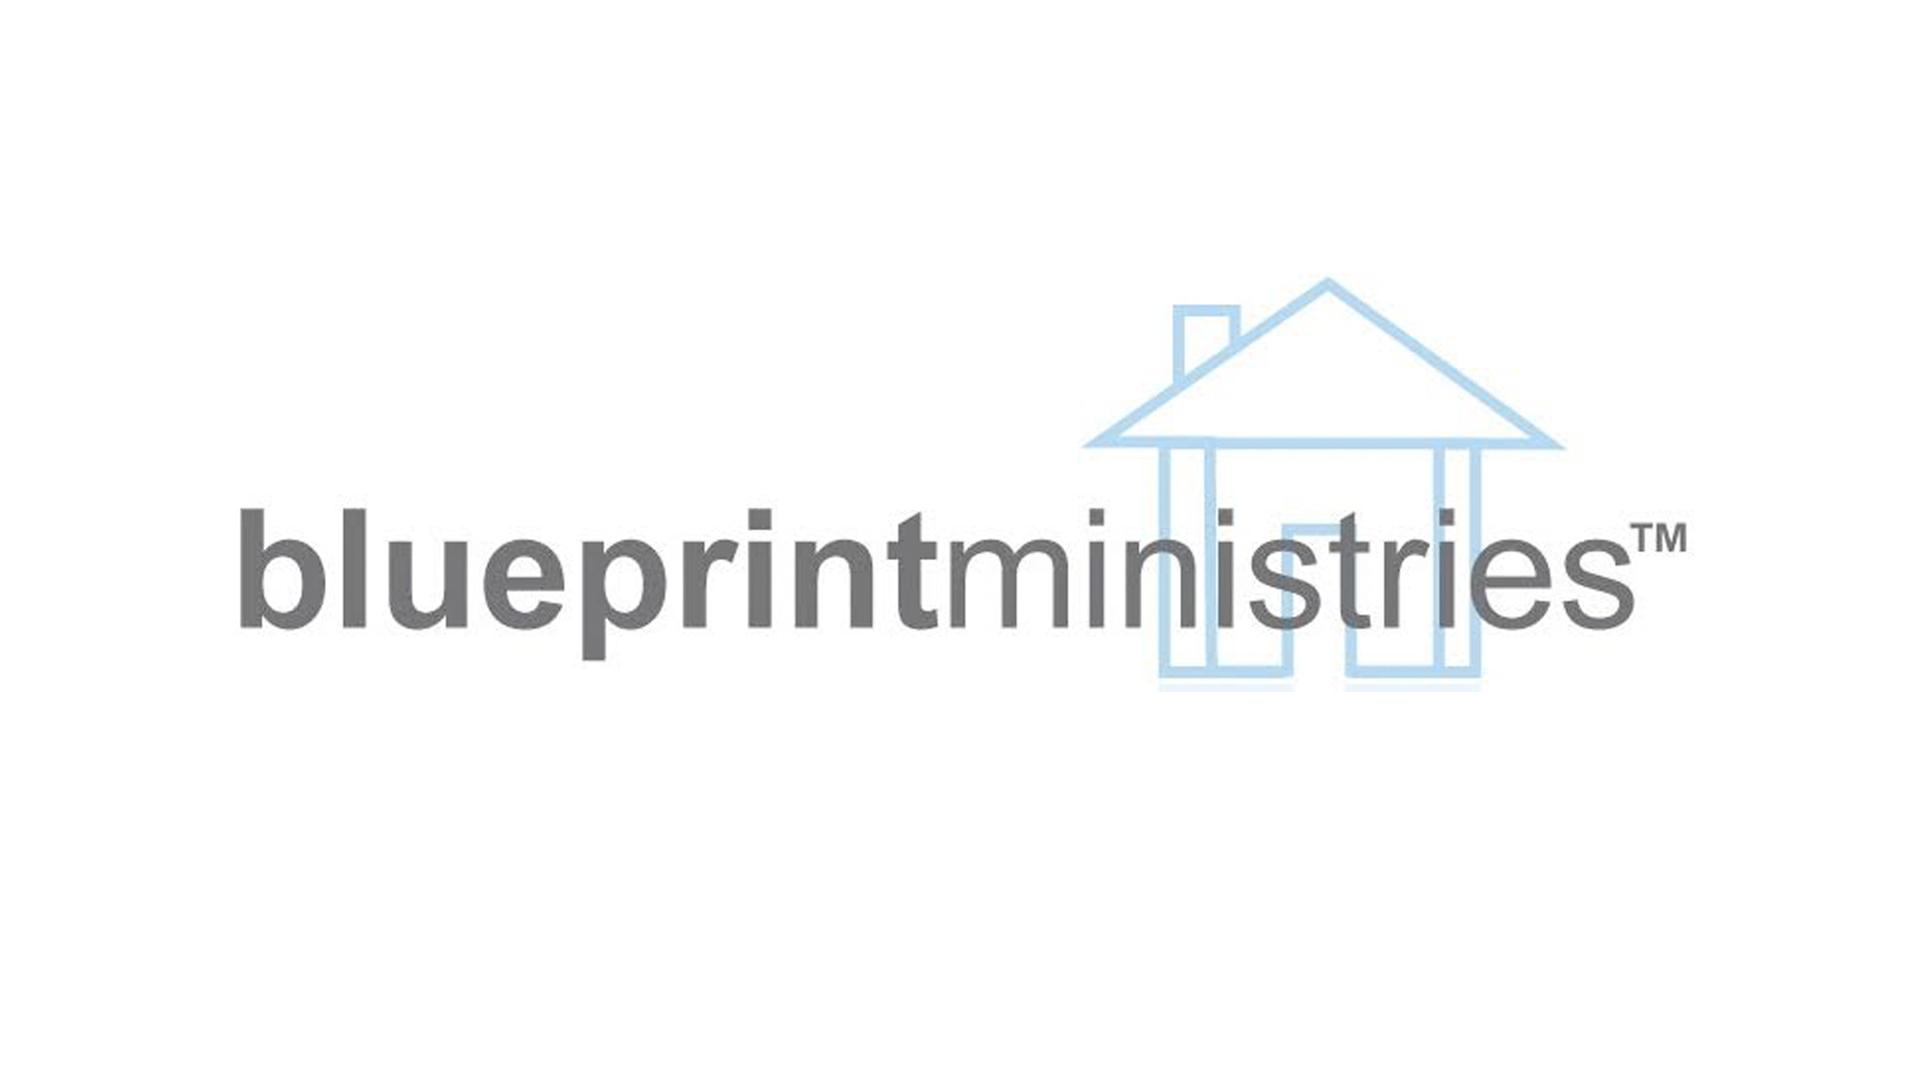 Blueprint ministries the arsenal sa malvernweather Gallery